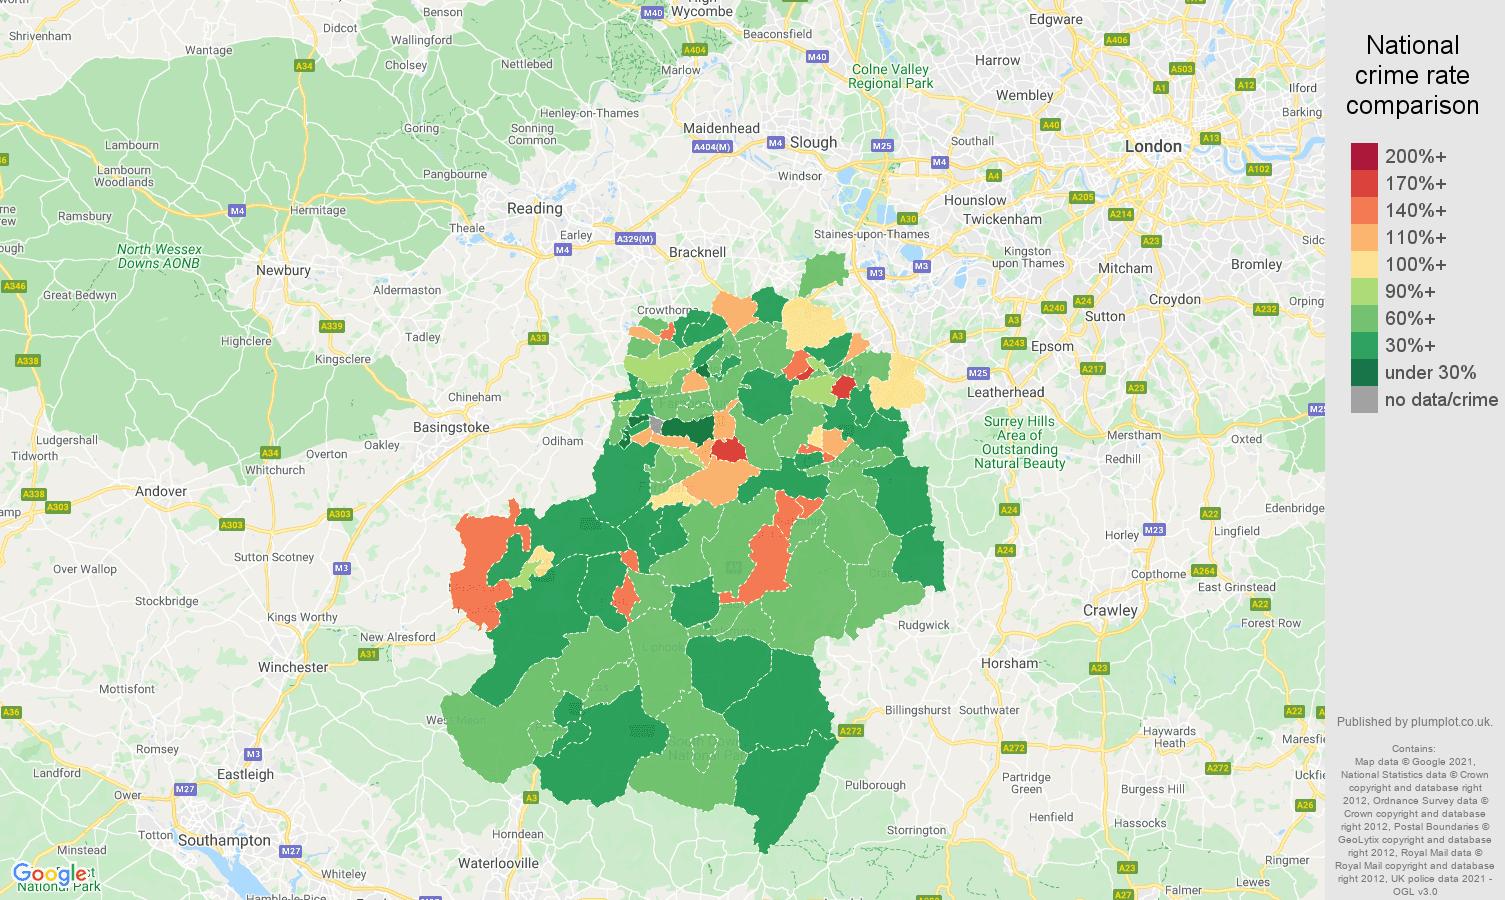 Guildford criminal damage and arson crime rate comparison map